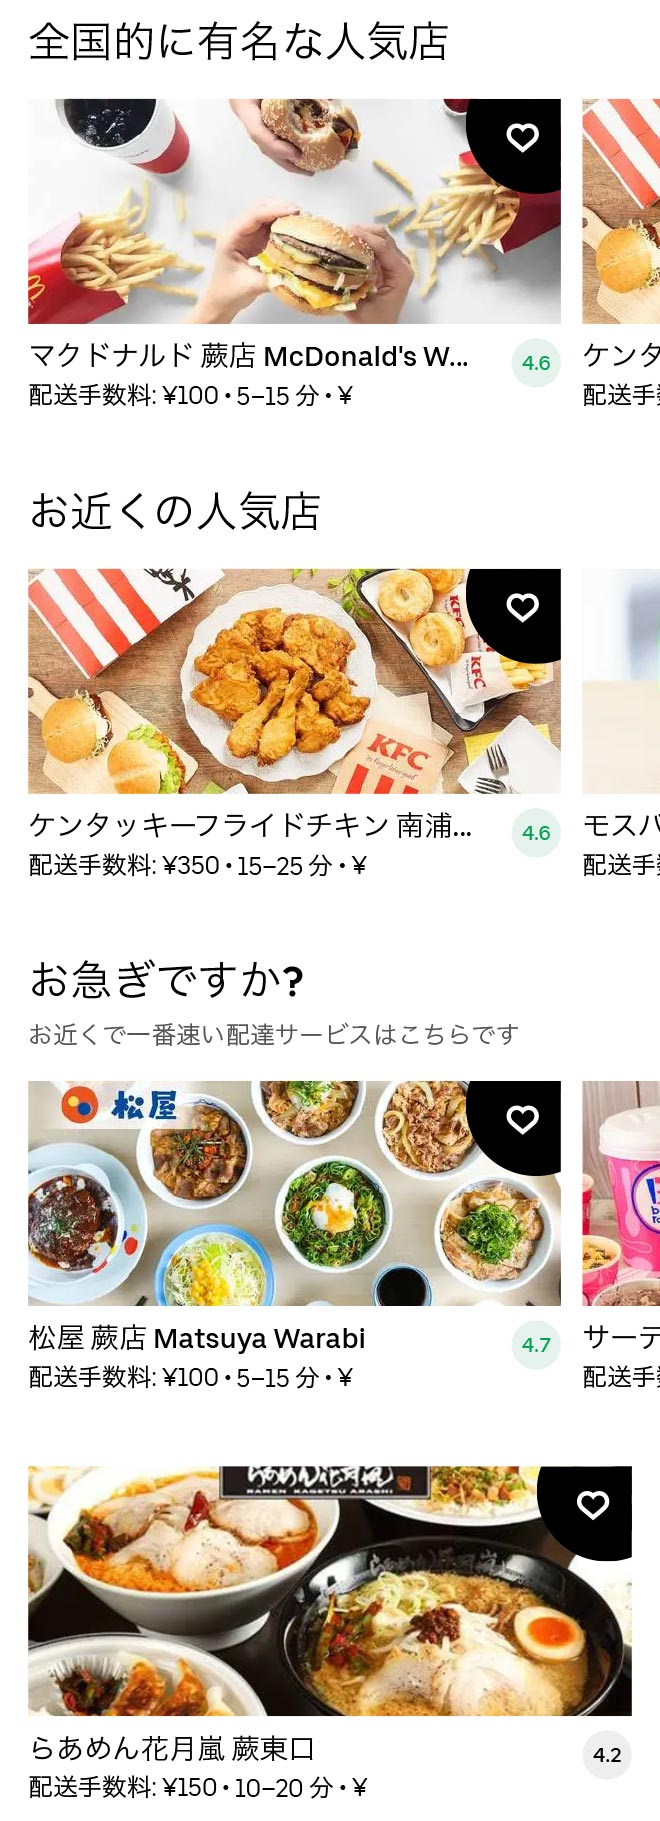 Warabi menu 2011 01